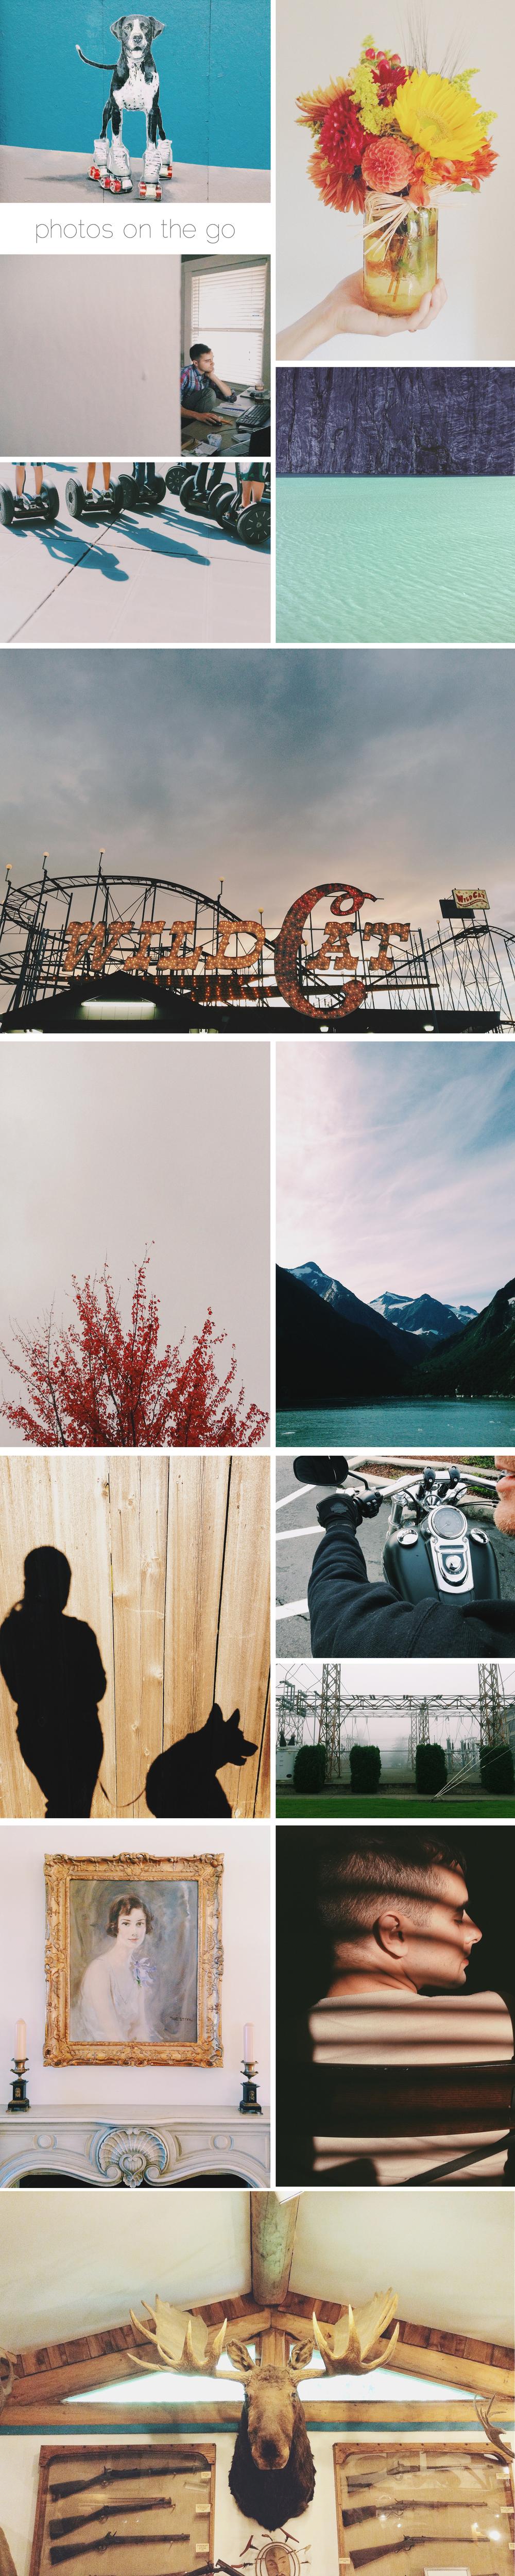 LisaLupo_Collage.jpg